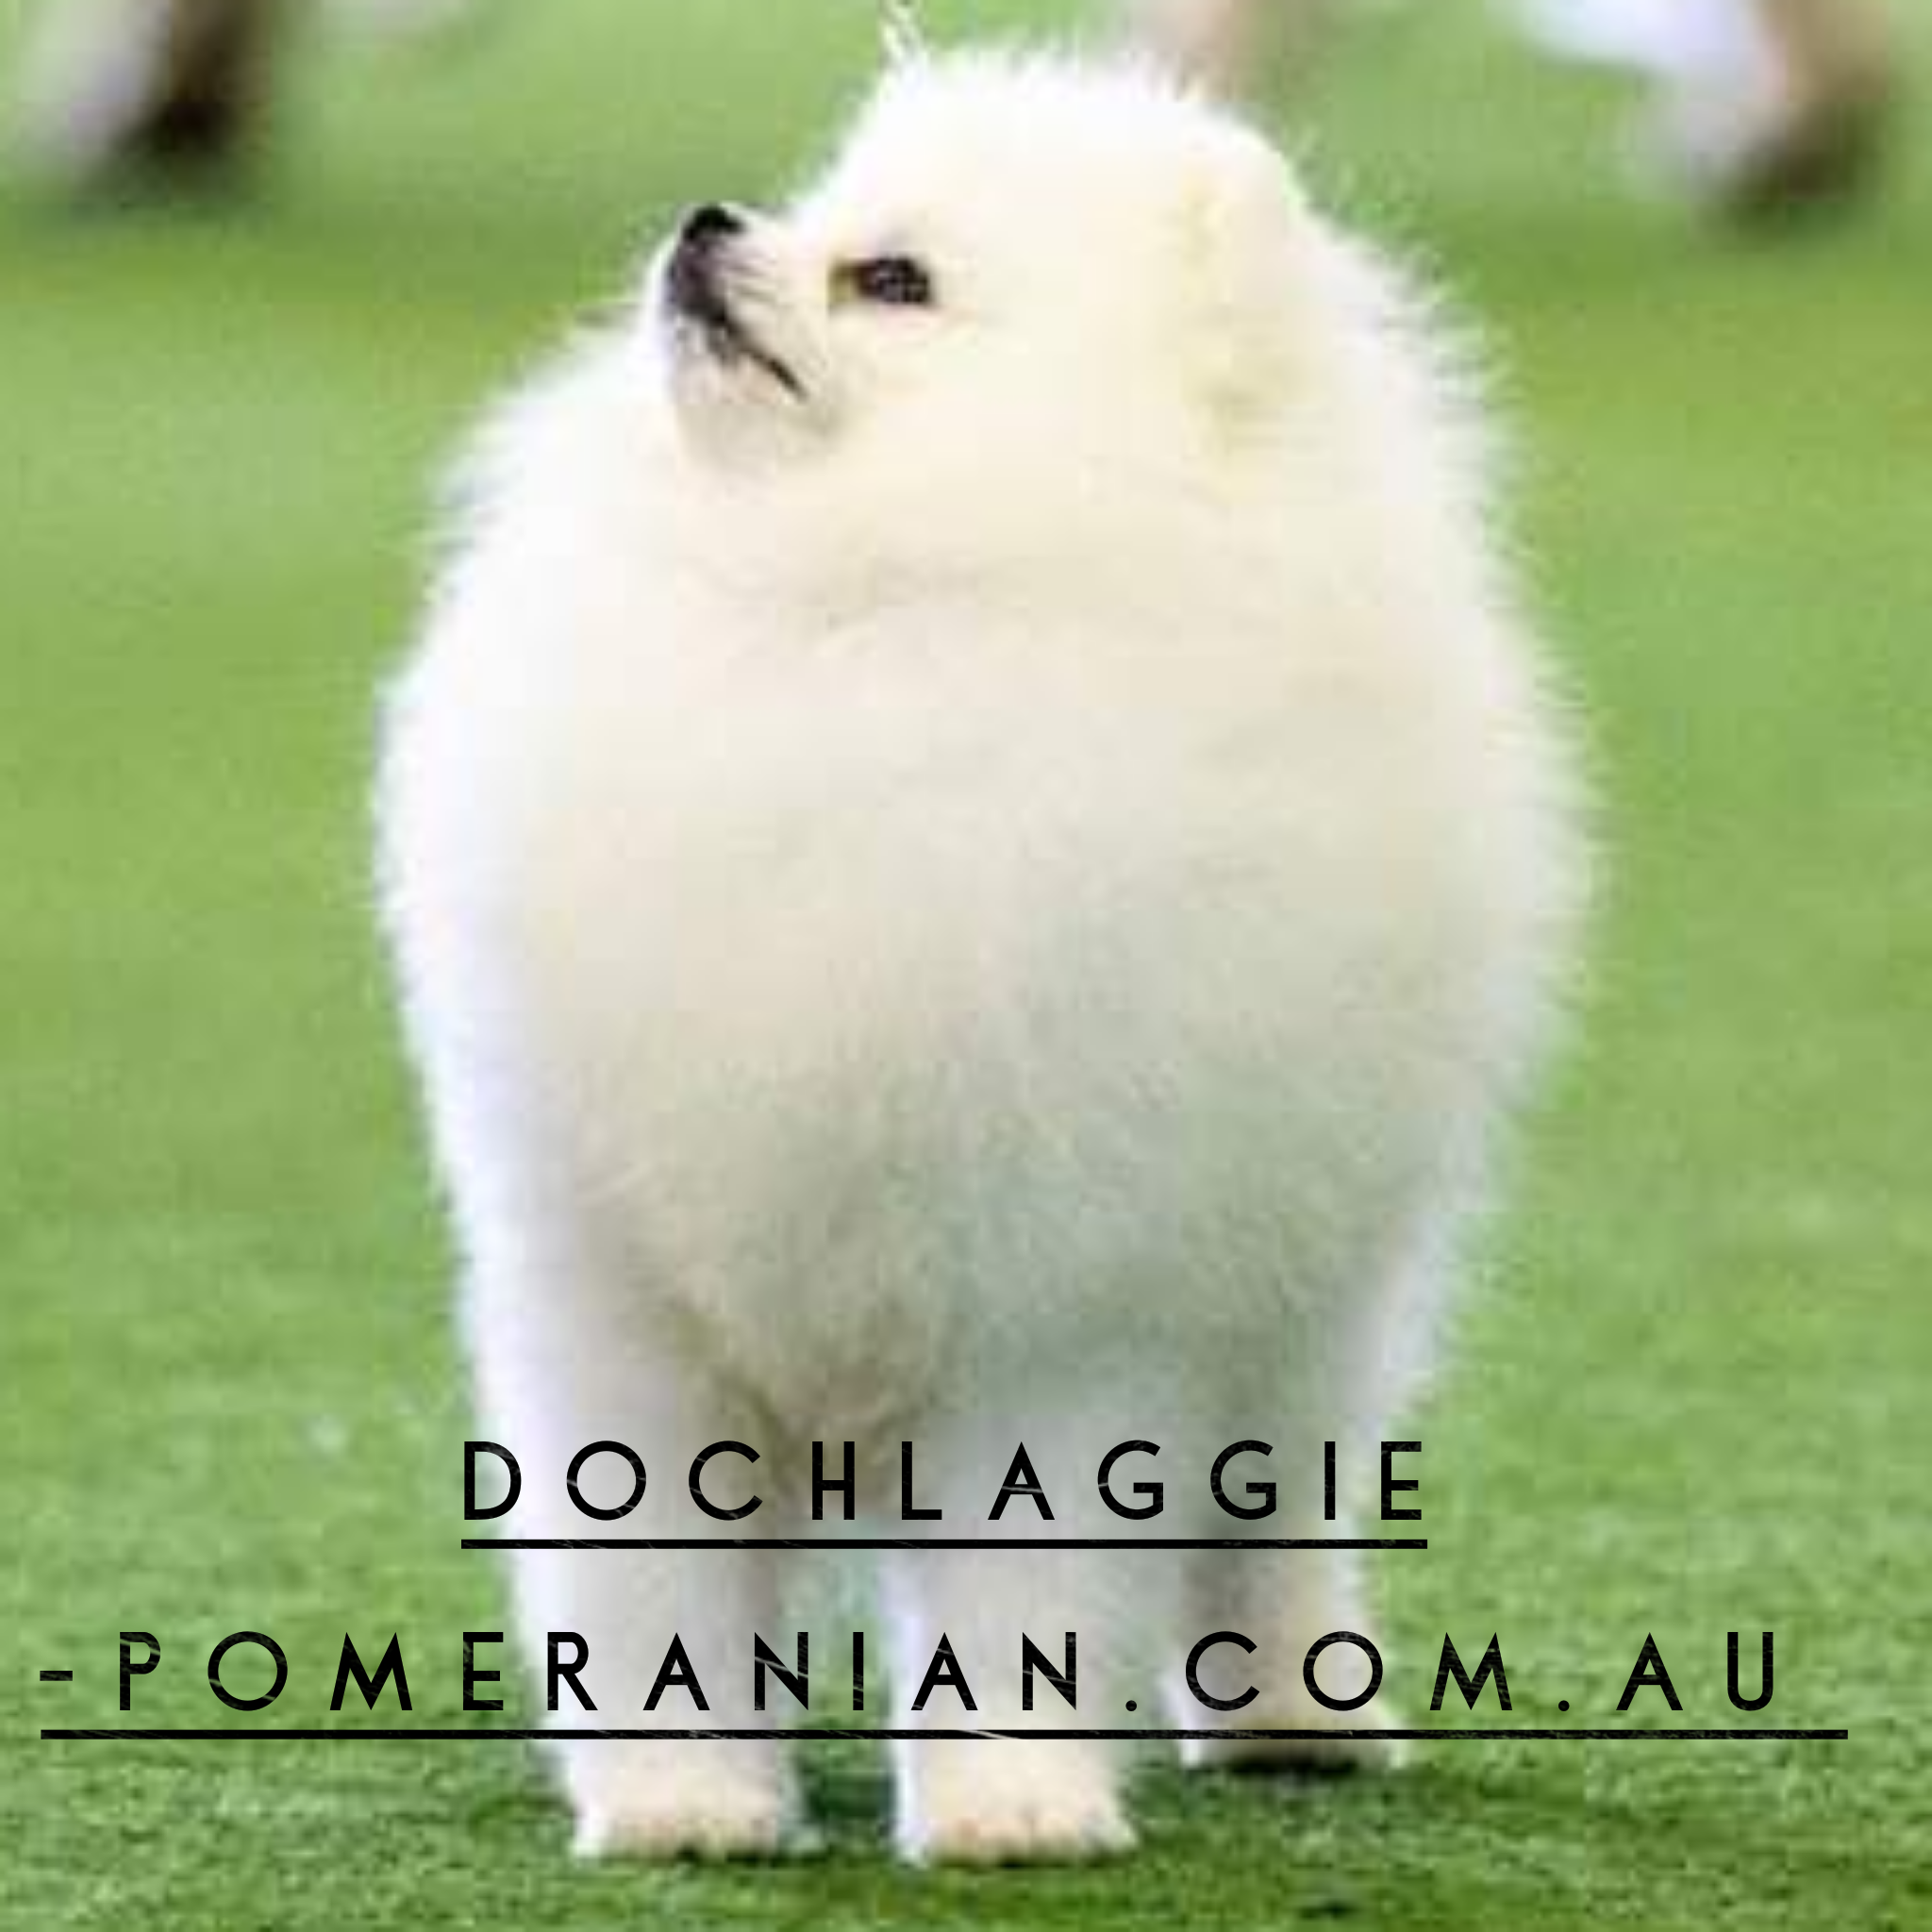 Dochlaggie Pomeranian Puppies Melbourne Dochlaggie Dochlaggiepomeranians Pomeranians Pomeranian Pomeraniandog With Images Pomeranian Pomeranian Puppy Puppies